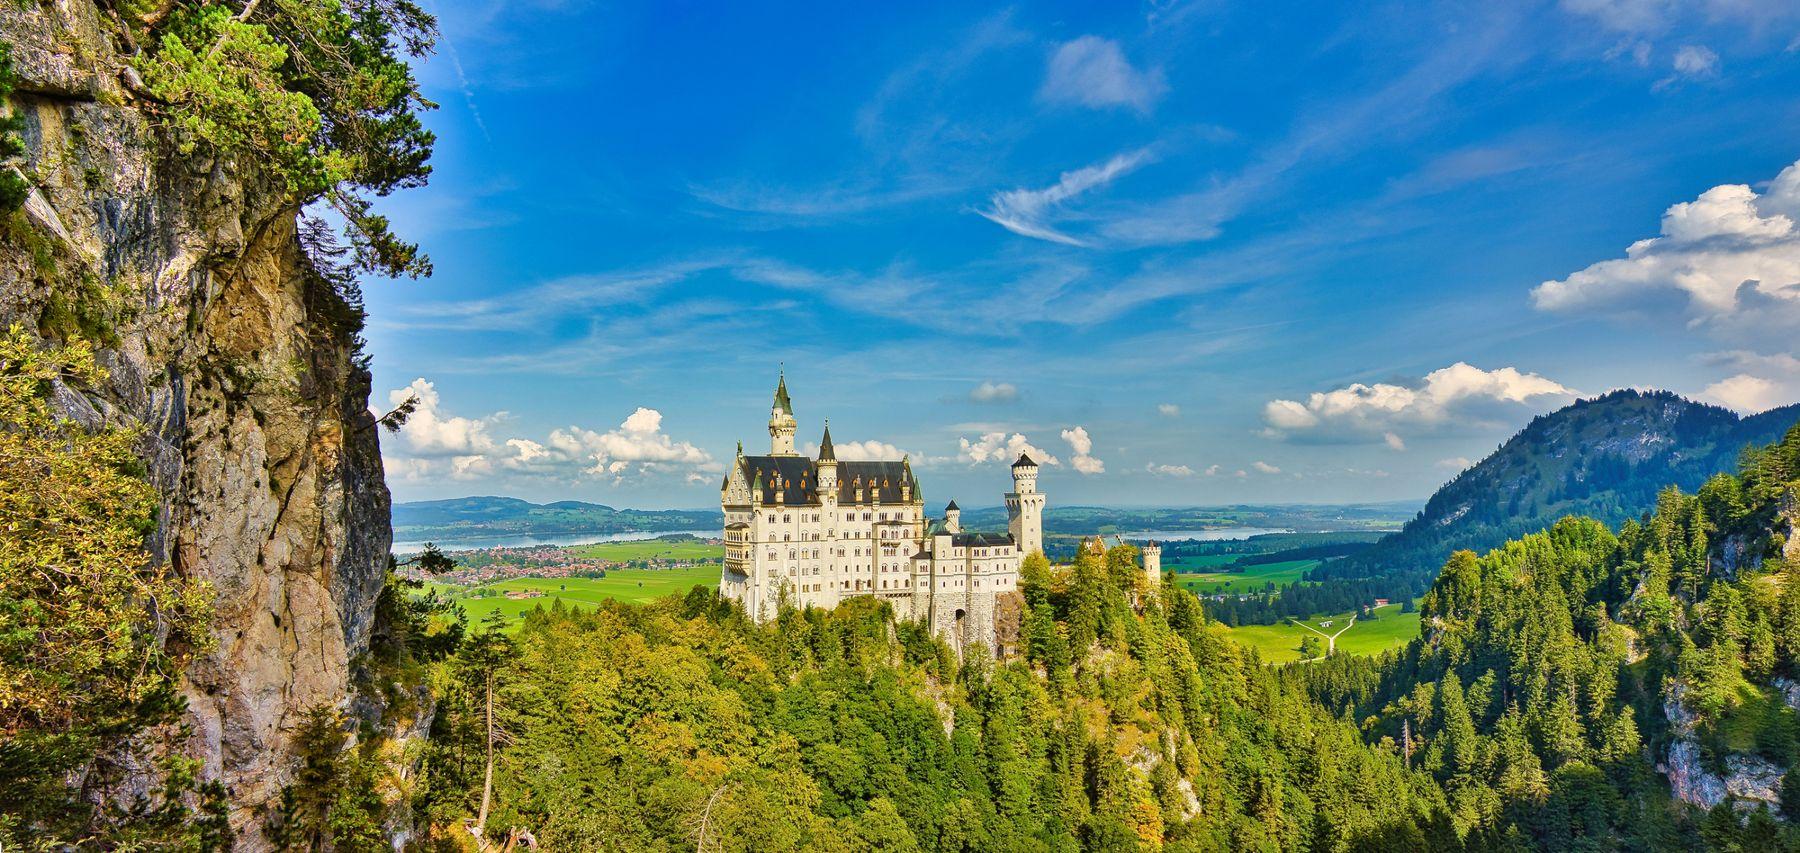 Нойшванштайн - сказочный замок